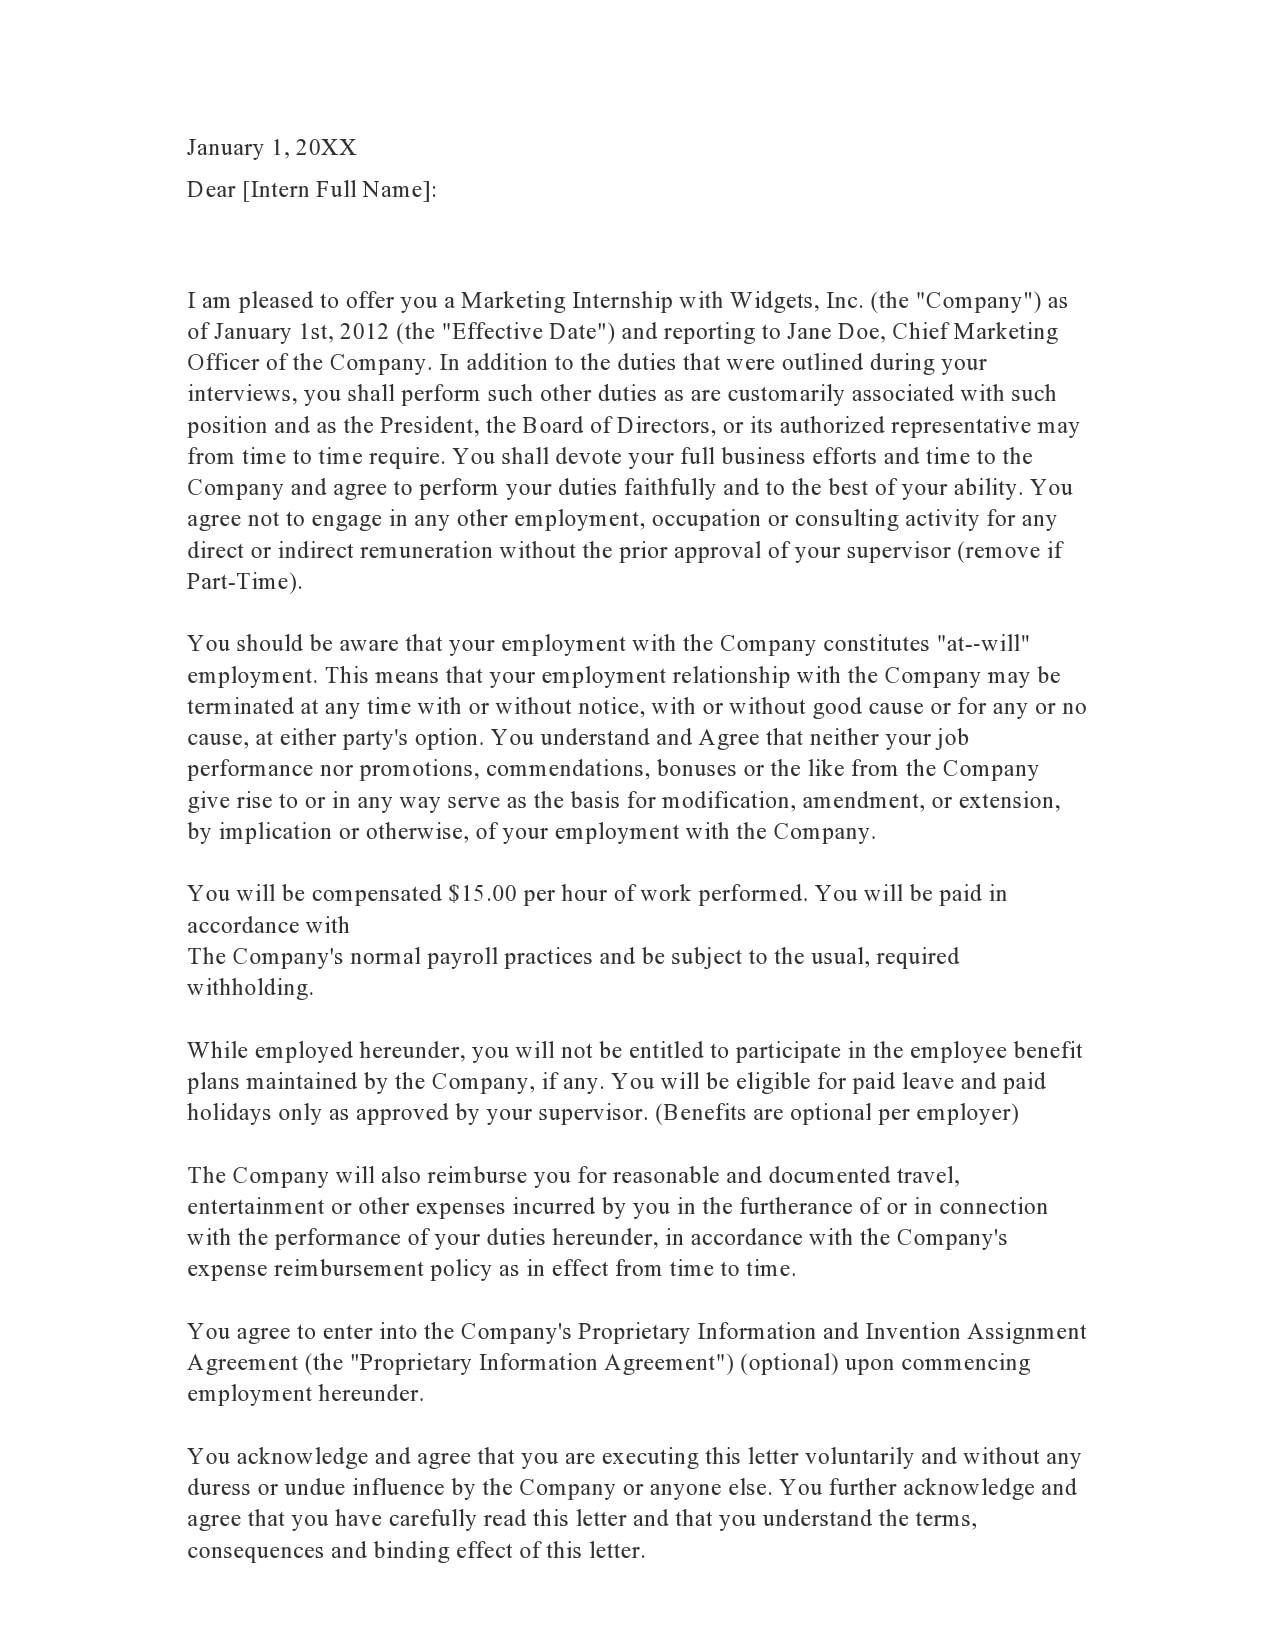 internship offer letter 25